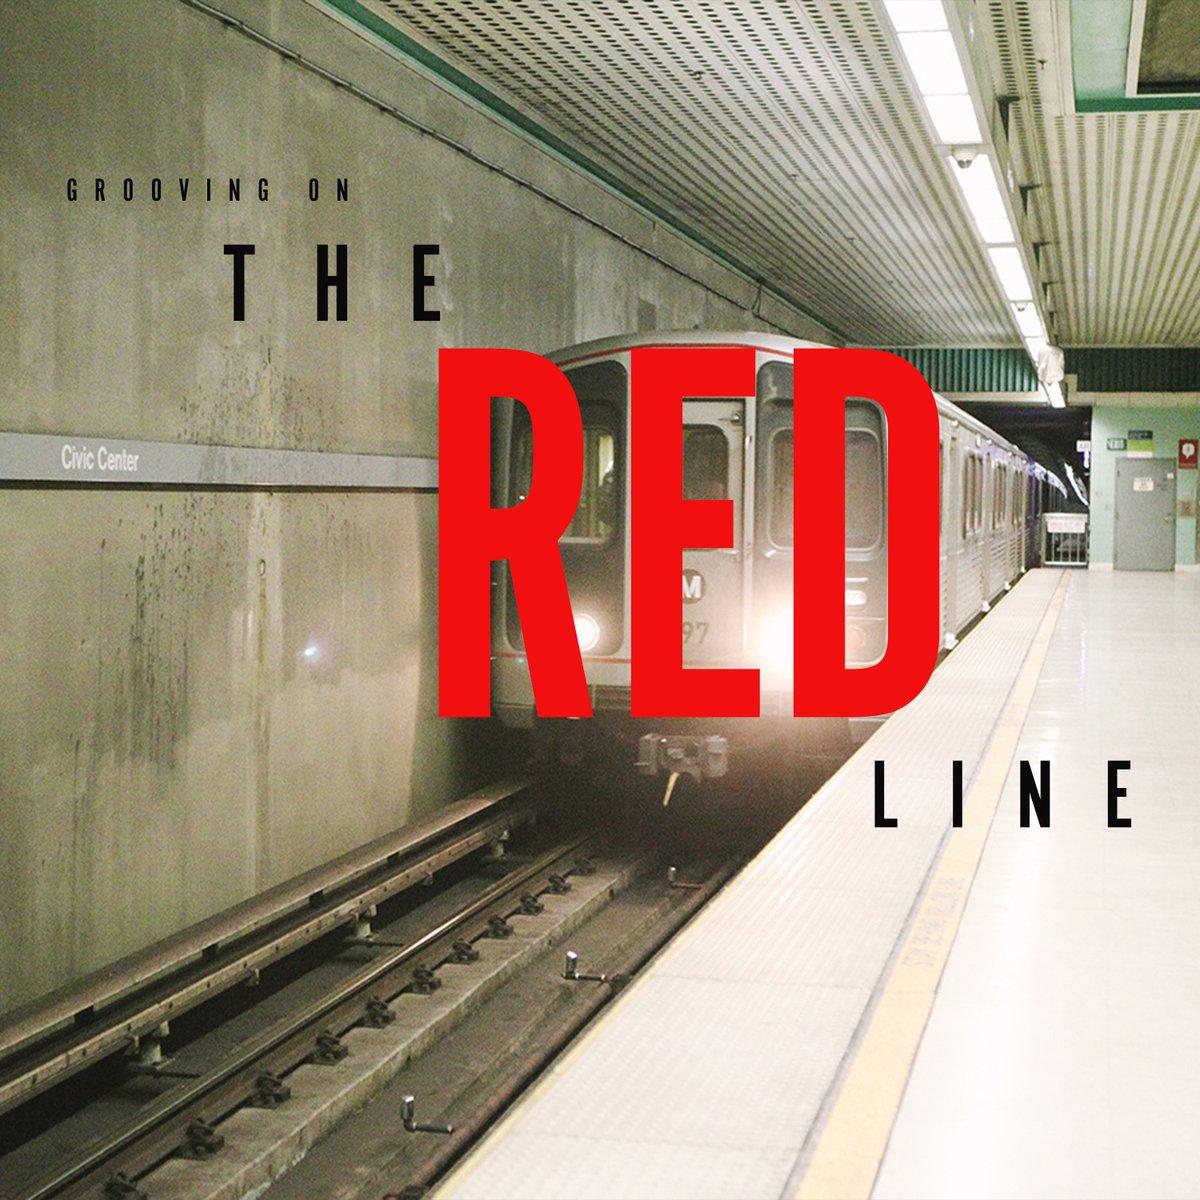 We're Grooving on the Red Line 🚇 // Turning It On  . . . . #newmusic #newartist #turningiton #keithaustinmusic #newmusicalert #newmusicfriday #lamusic #losangelesmusic #musicproducer #musicproduction #pop #funk #neosoul #rnb #originalmusic #originalsongs #songwriter #losangeles https://t.co/KTr6OJIlI2